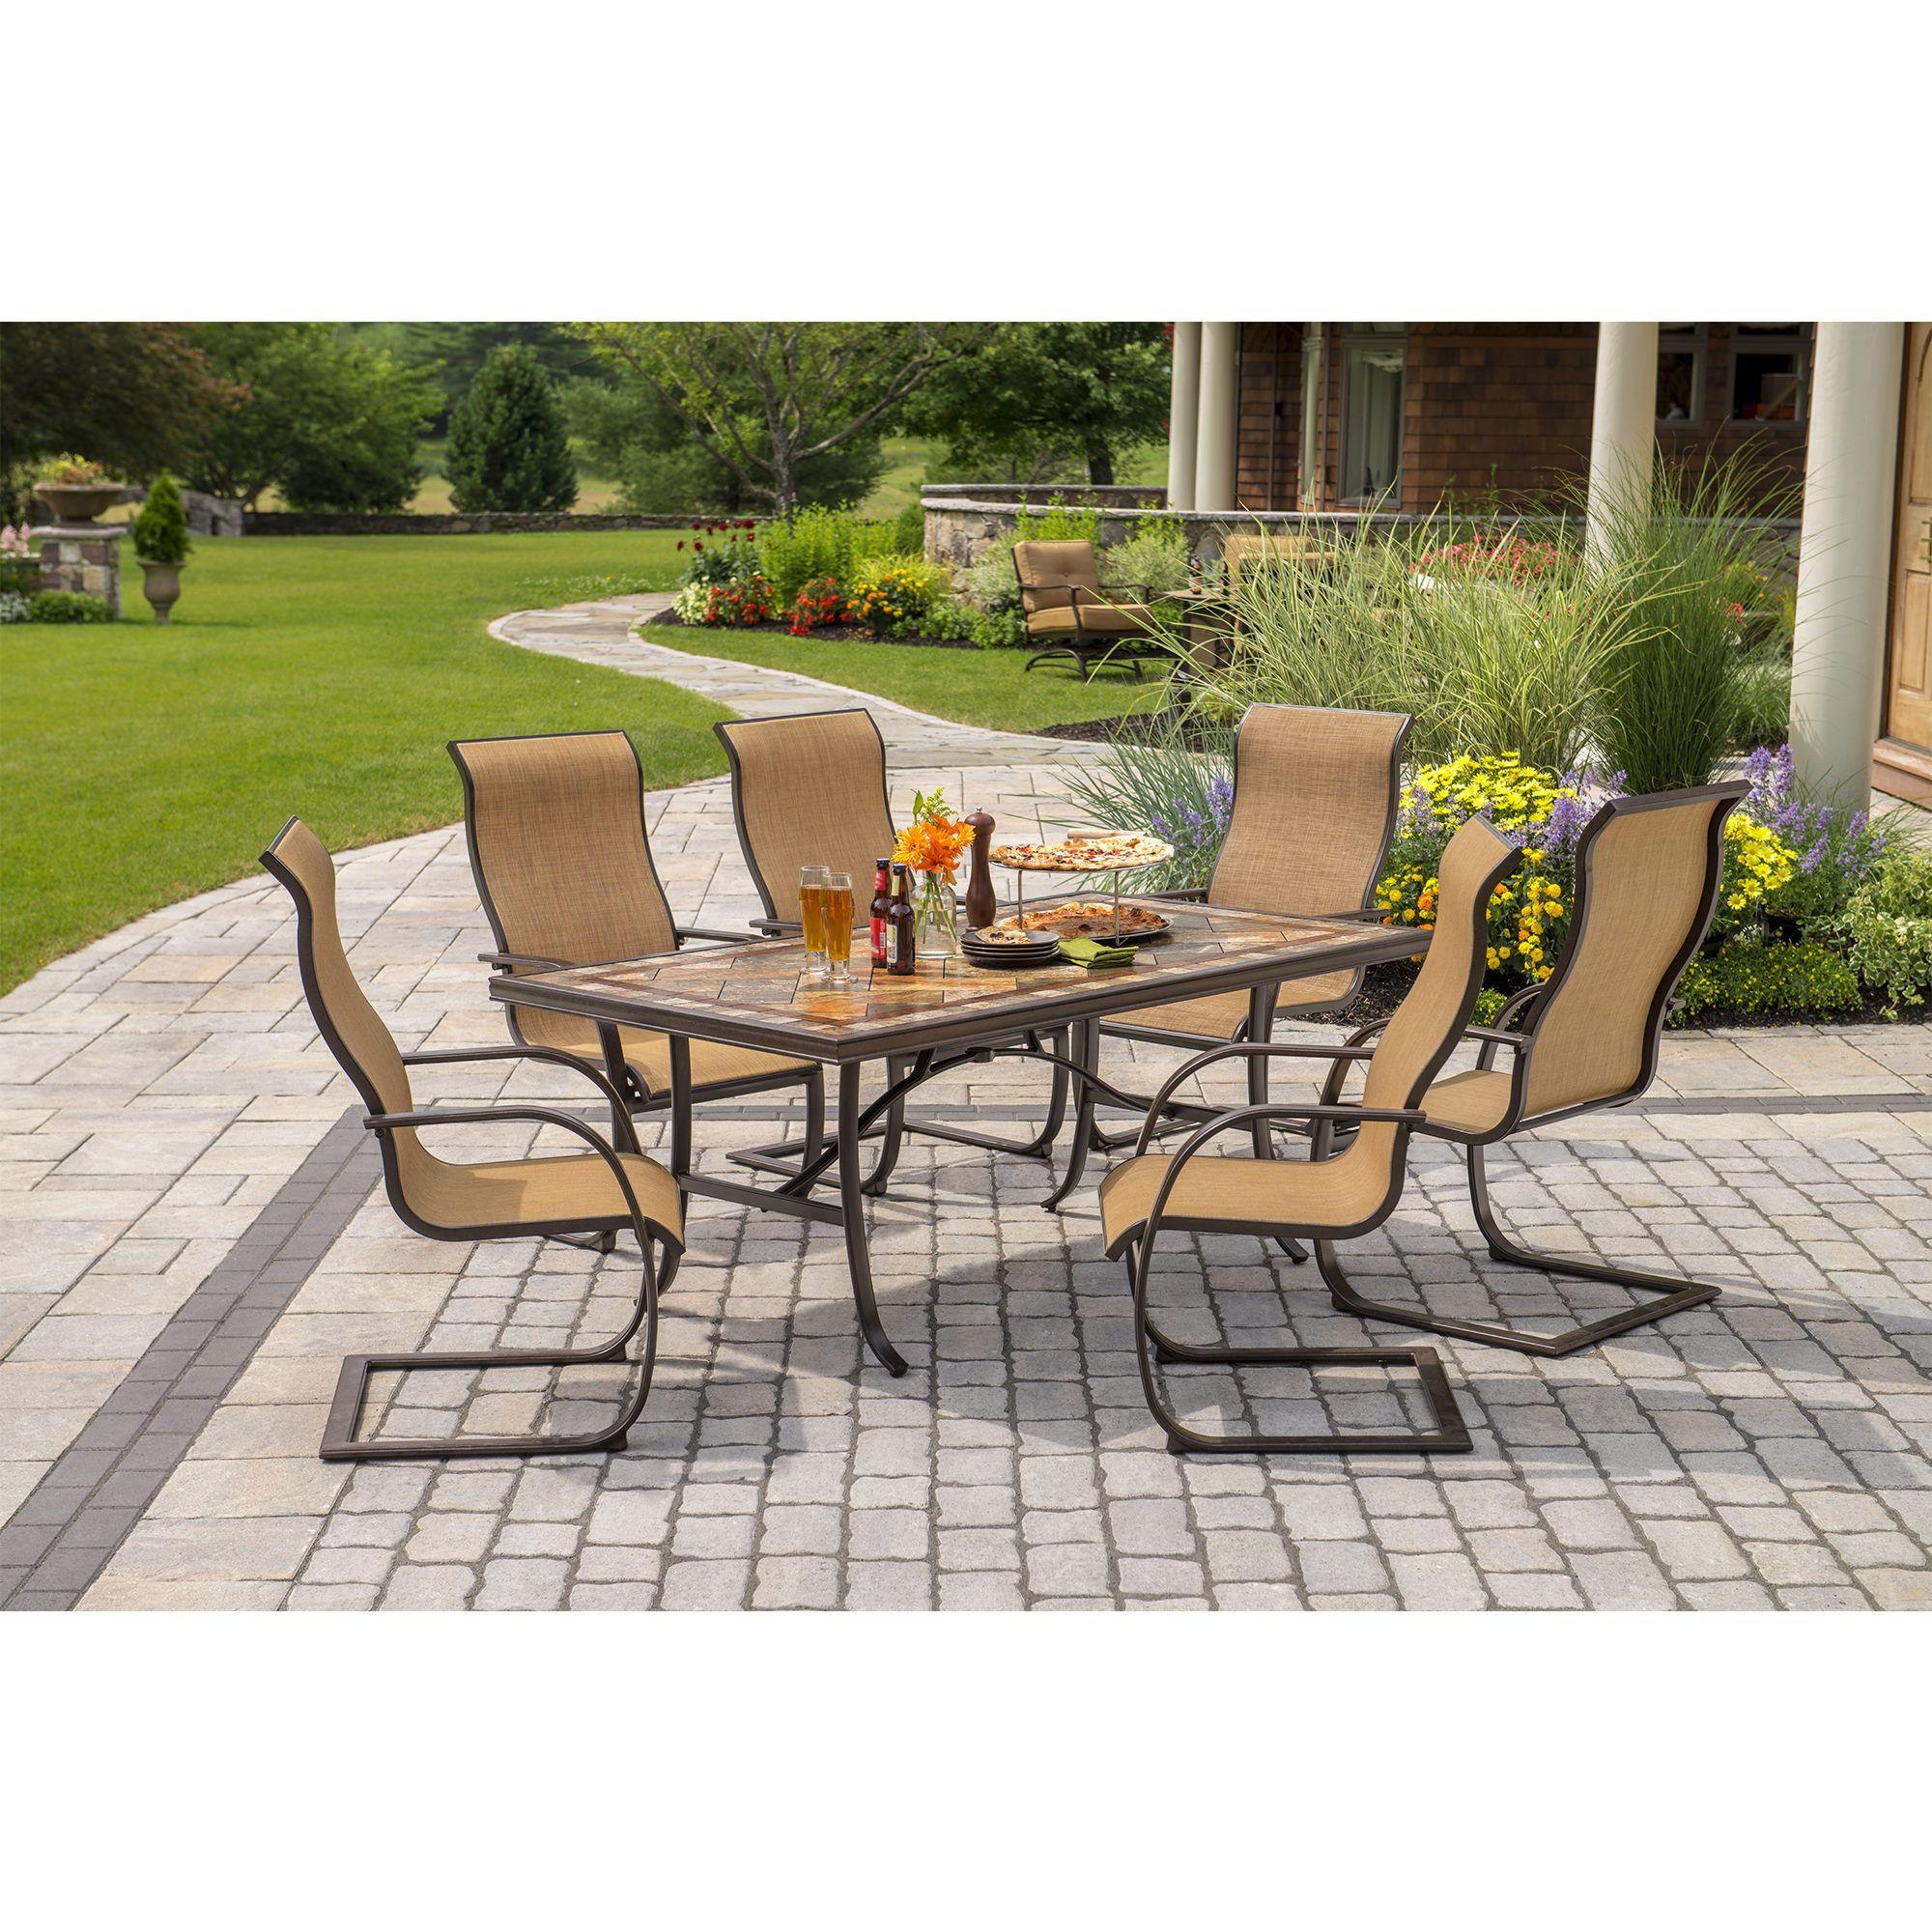 image table teak patio of jensen clearance furniture furnitures dining furnituresteak wood restore